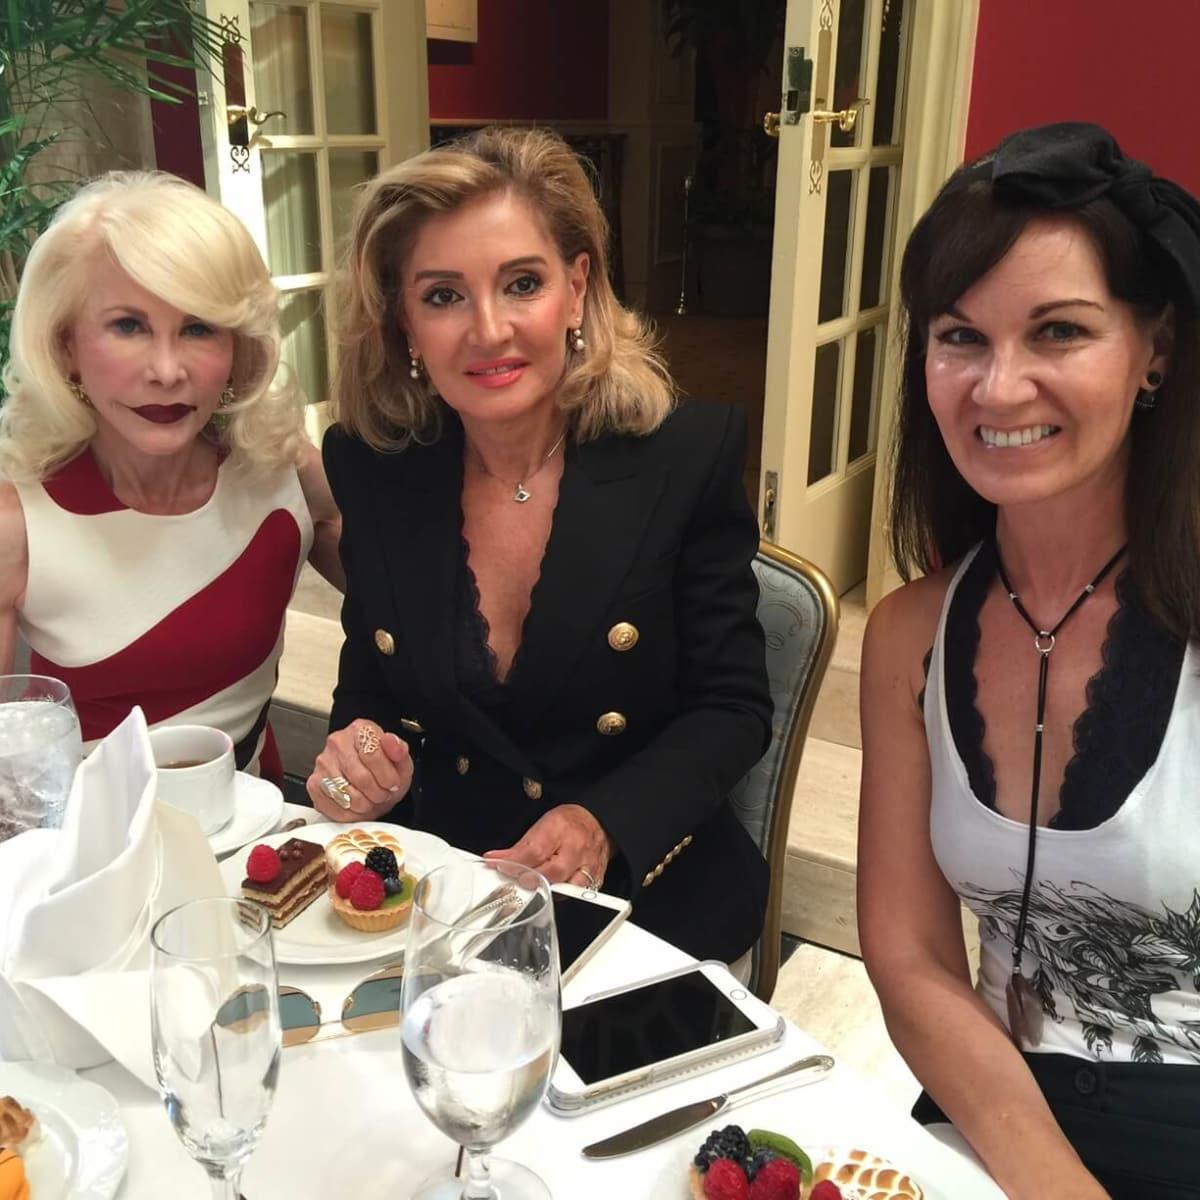 Fe Zande Fashion Show, Sept. 2016, Diane Lokey Farb, Johanna Mounier, Beth Muecke